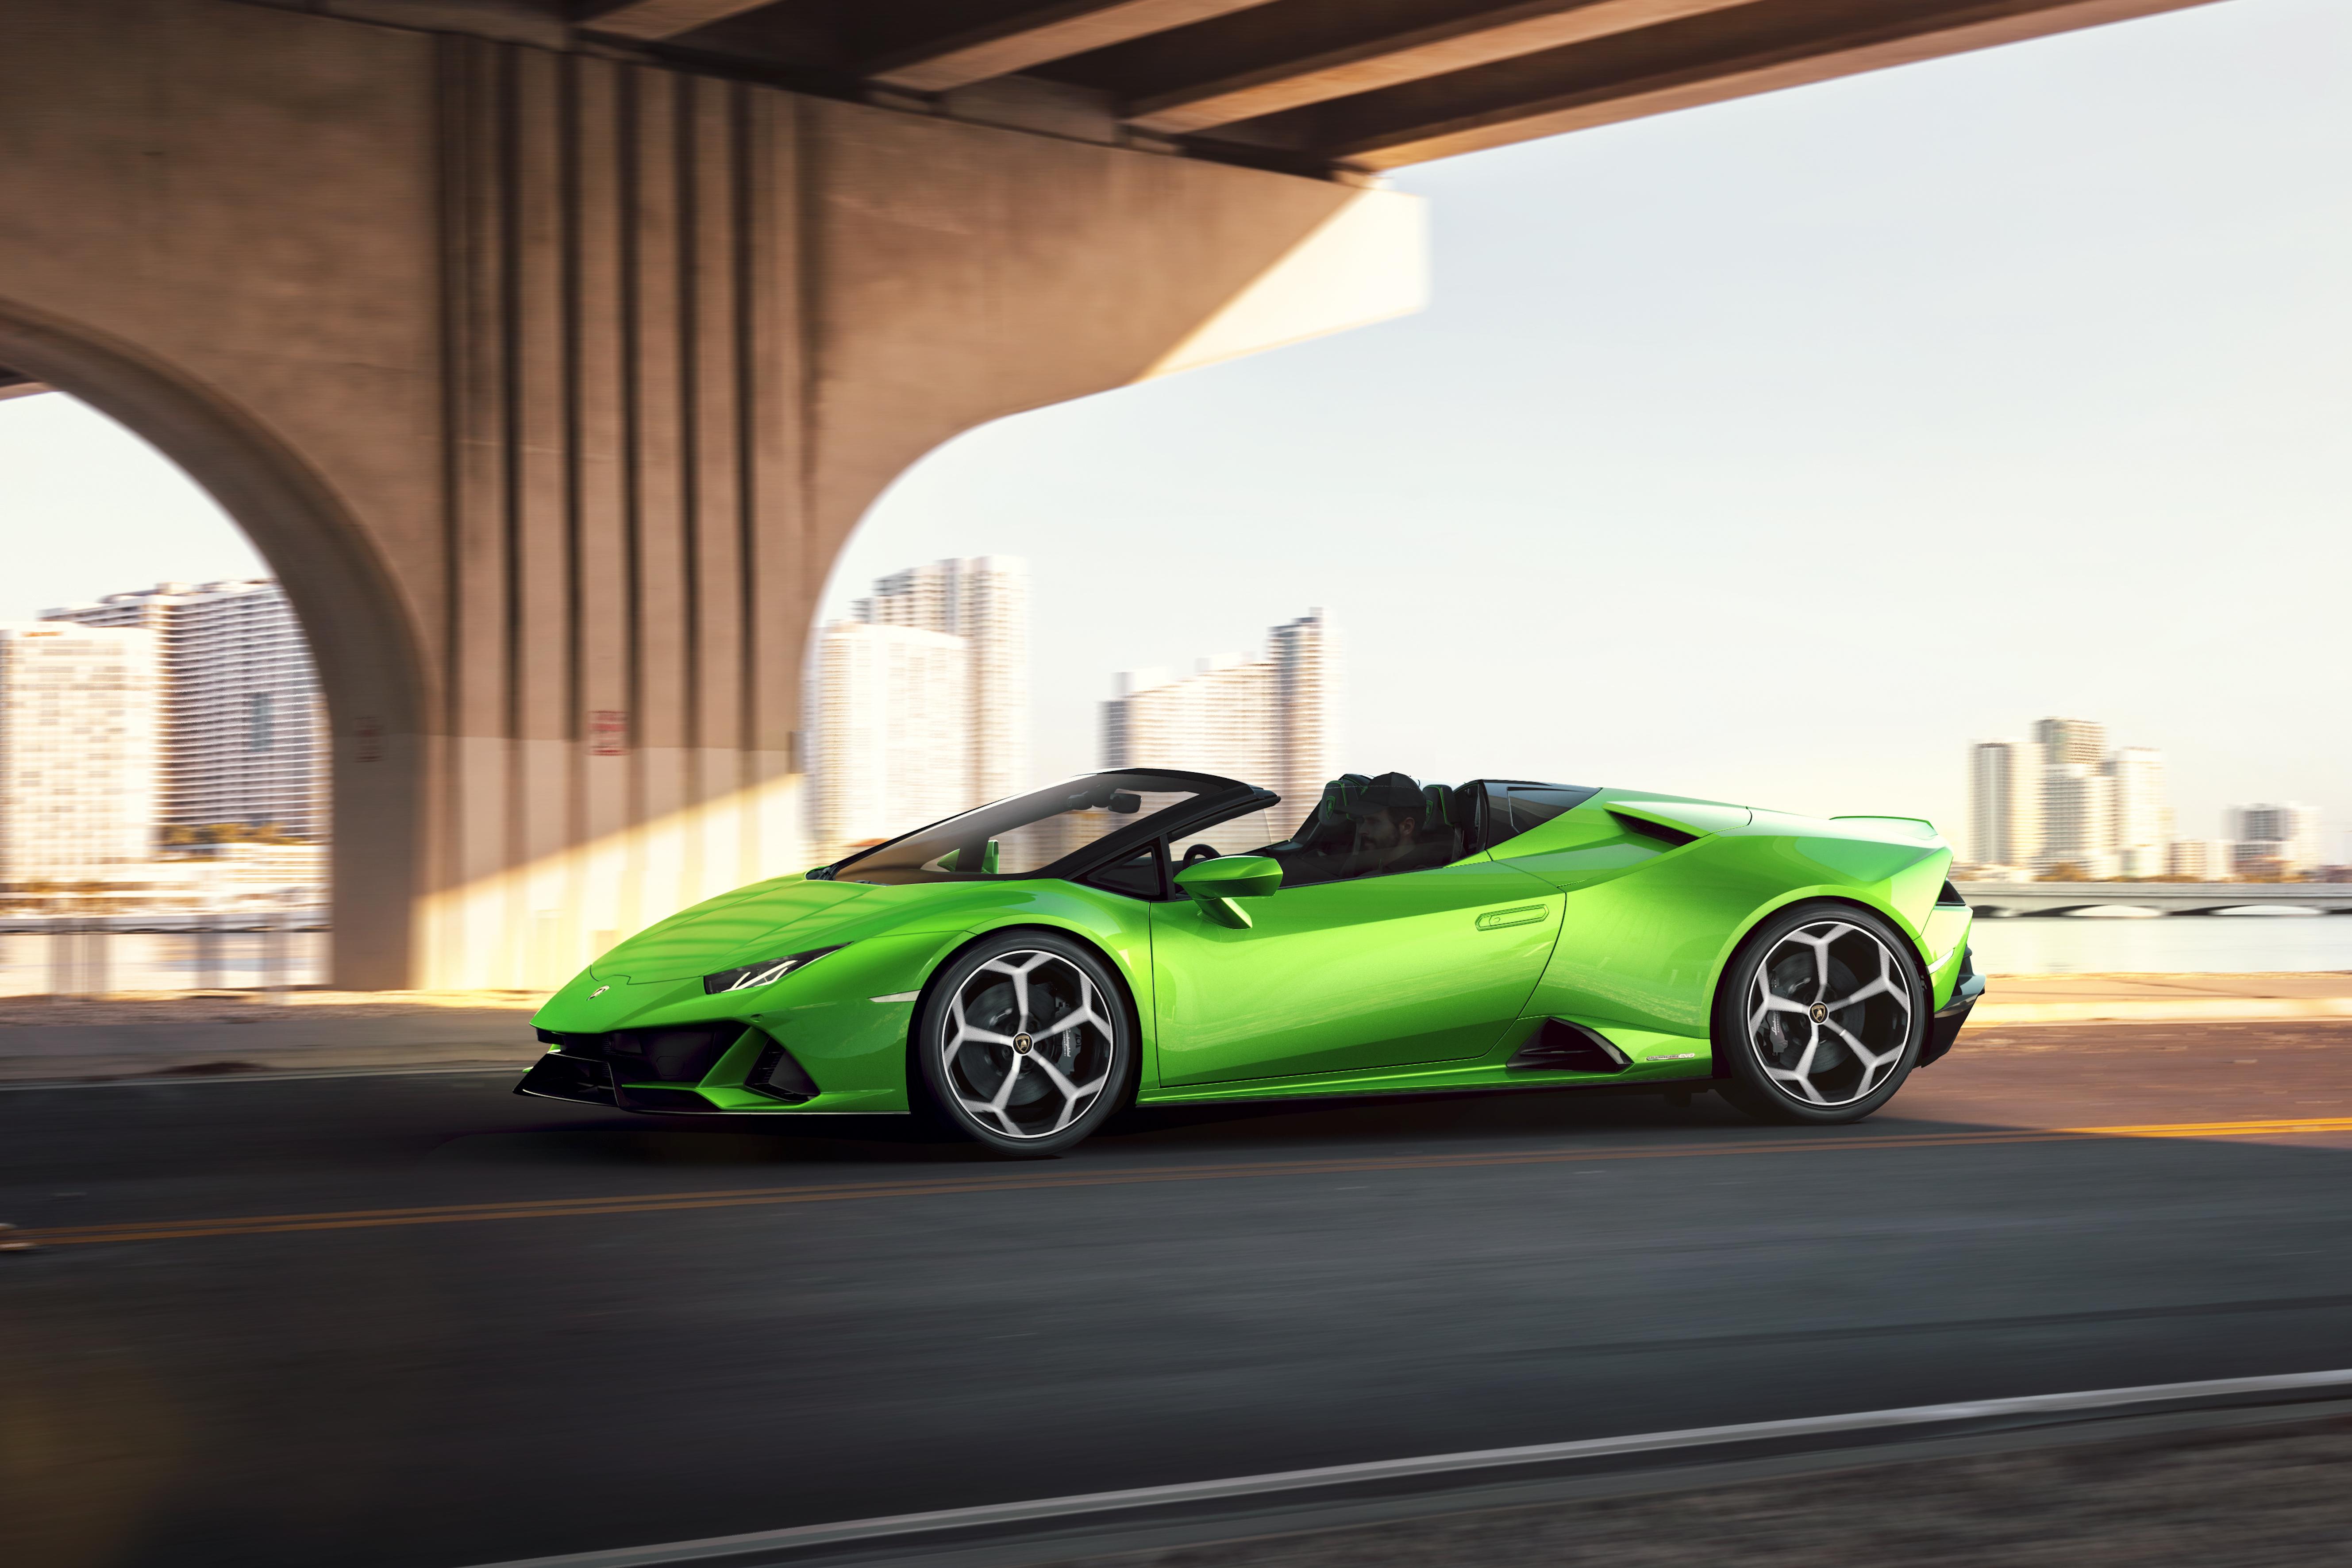 2019 Lamborghini Huracan Evo Spyder Side View, HD Cars, 4k